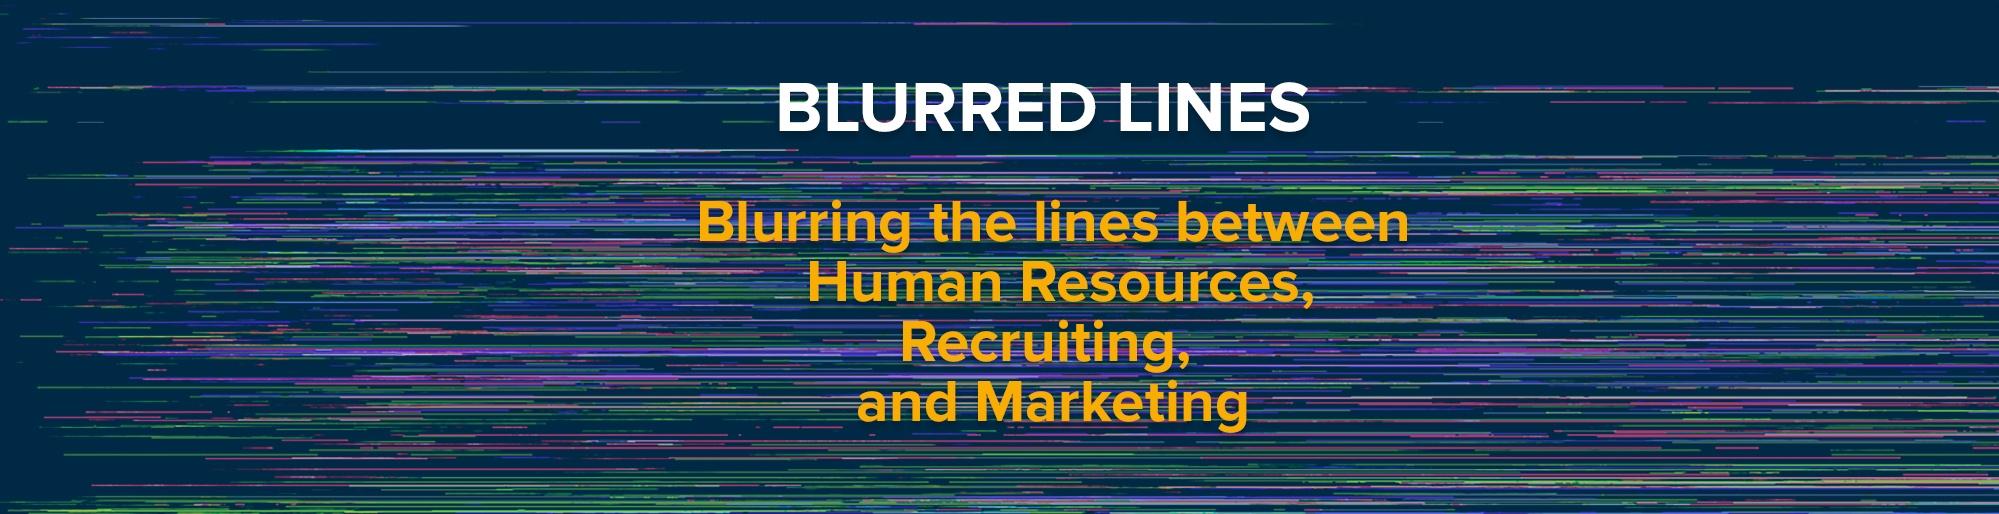 Blurred-Lines.jpg